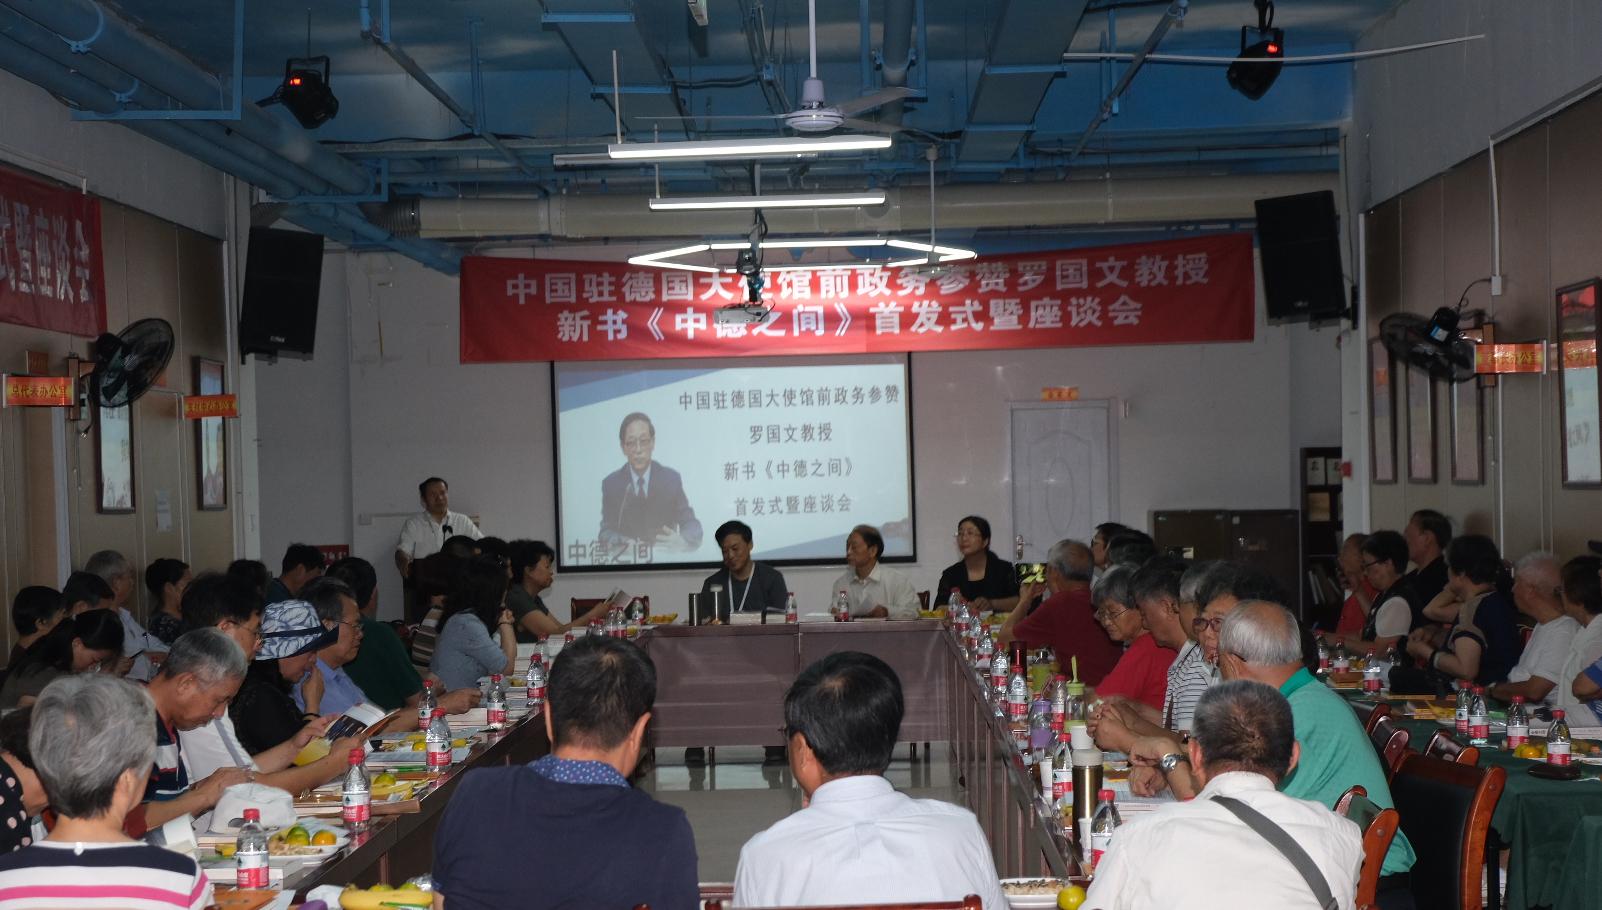 <b>世界知识出版社新书《中德之间》首发式在京举行</b>